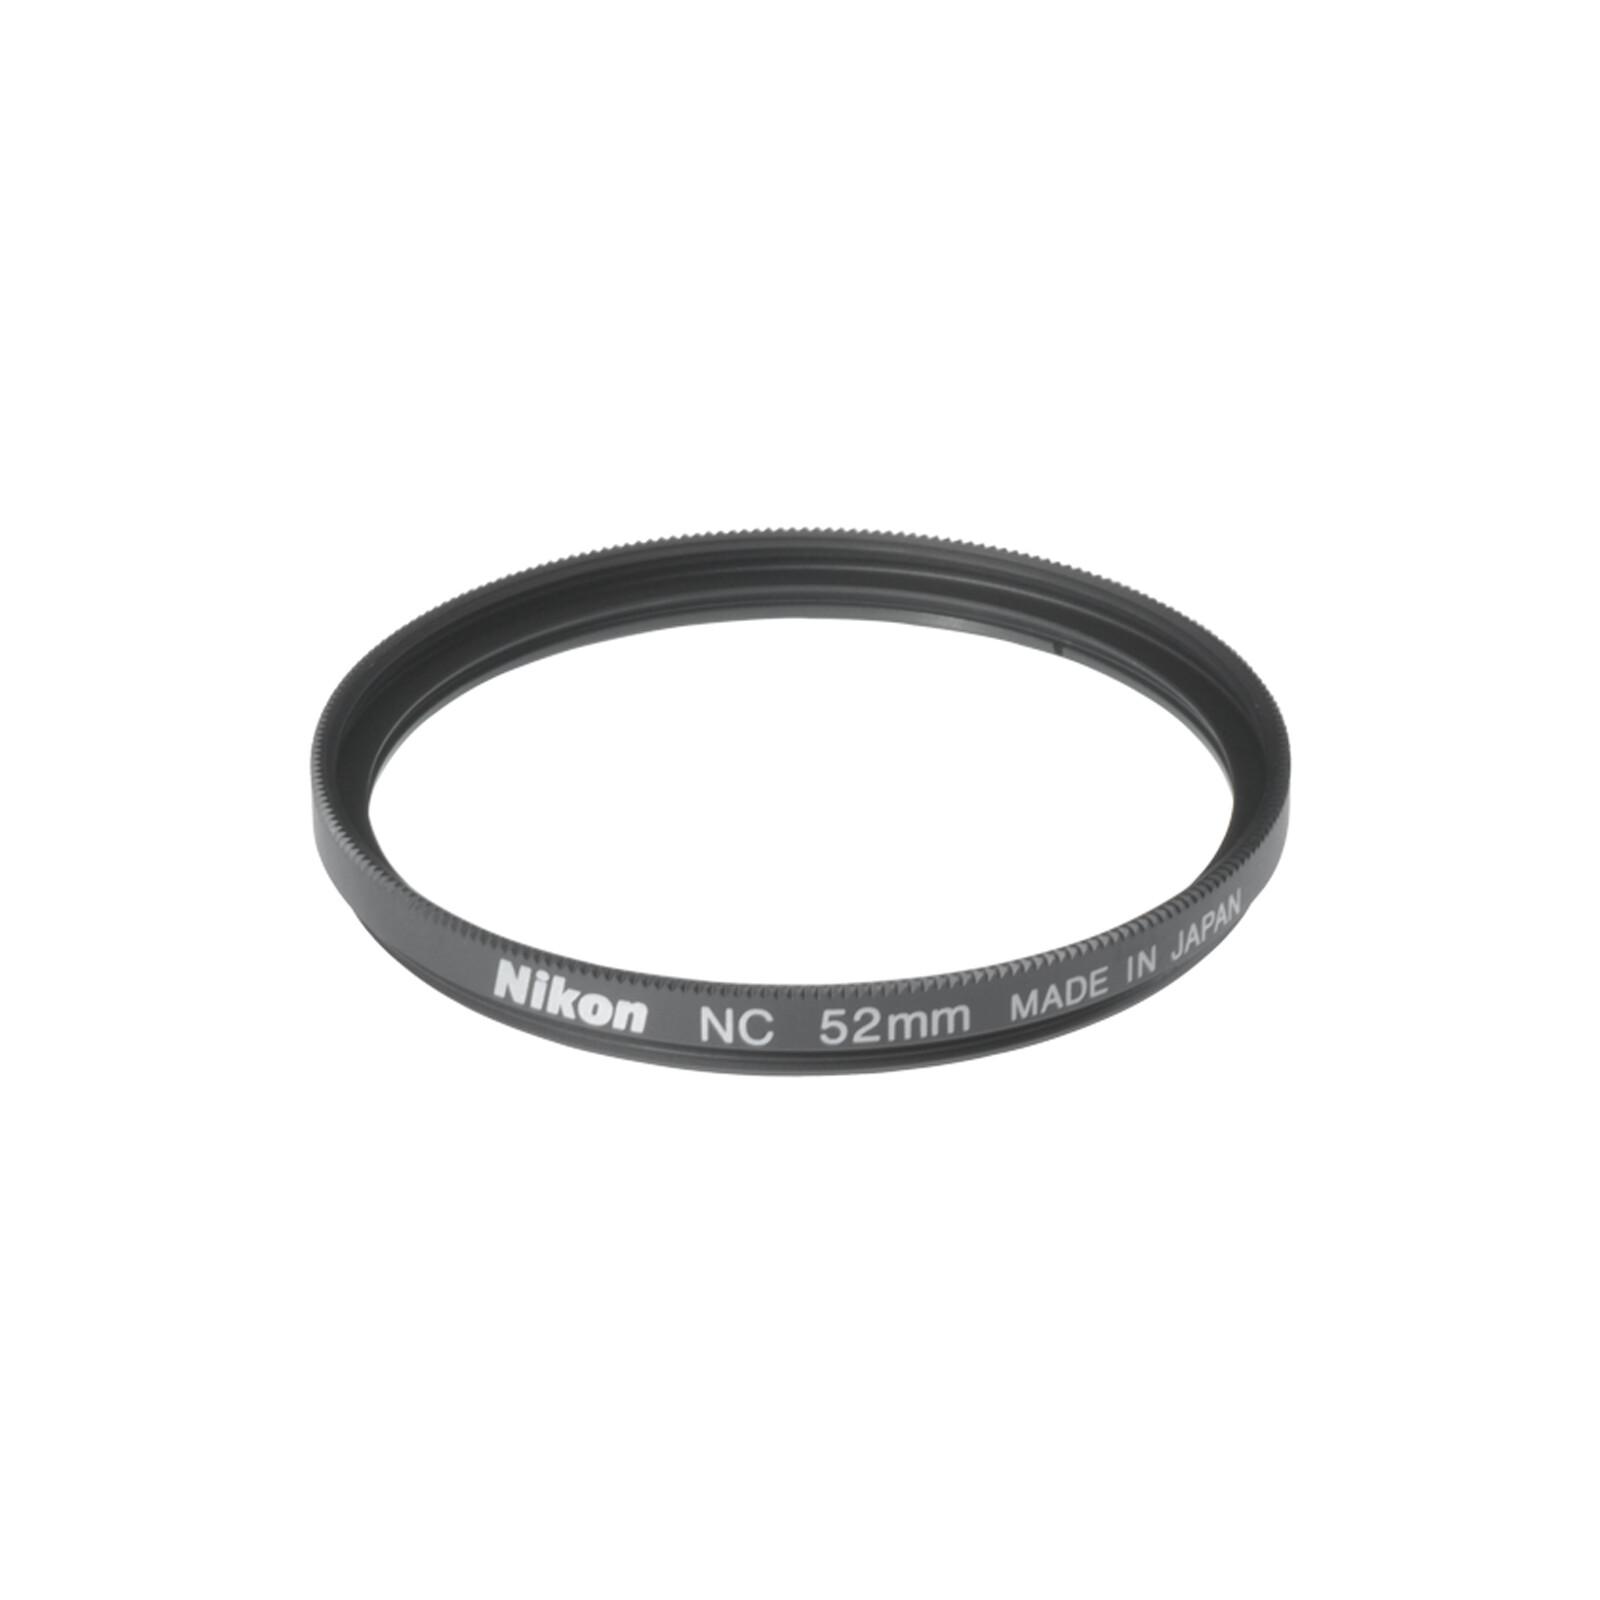 Nikon NC-52 NC Filter 52mm